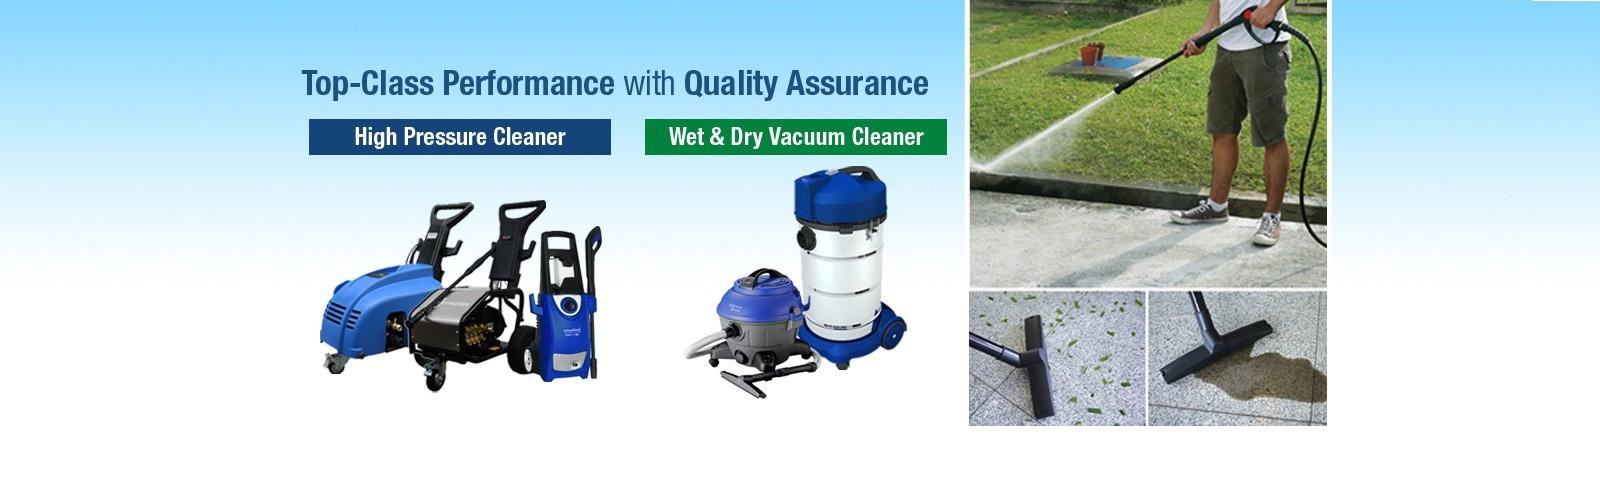 Alat Cleaning Pressure Washer Cv Prisindo Utama